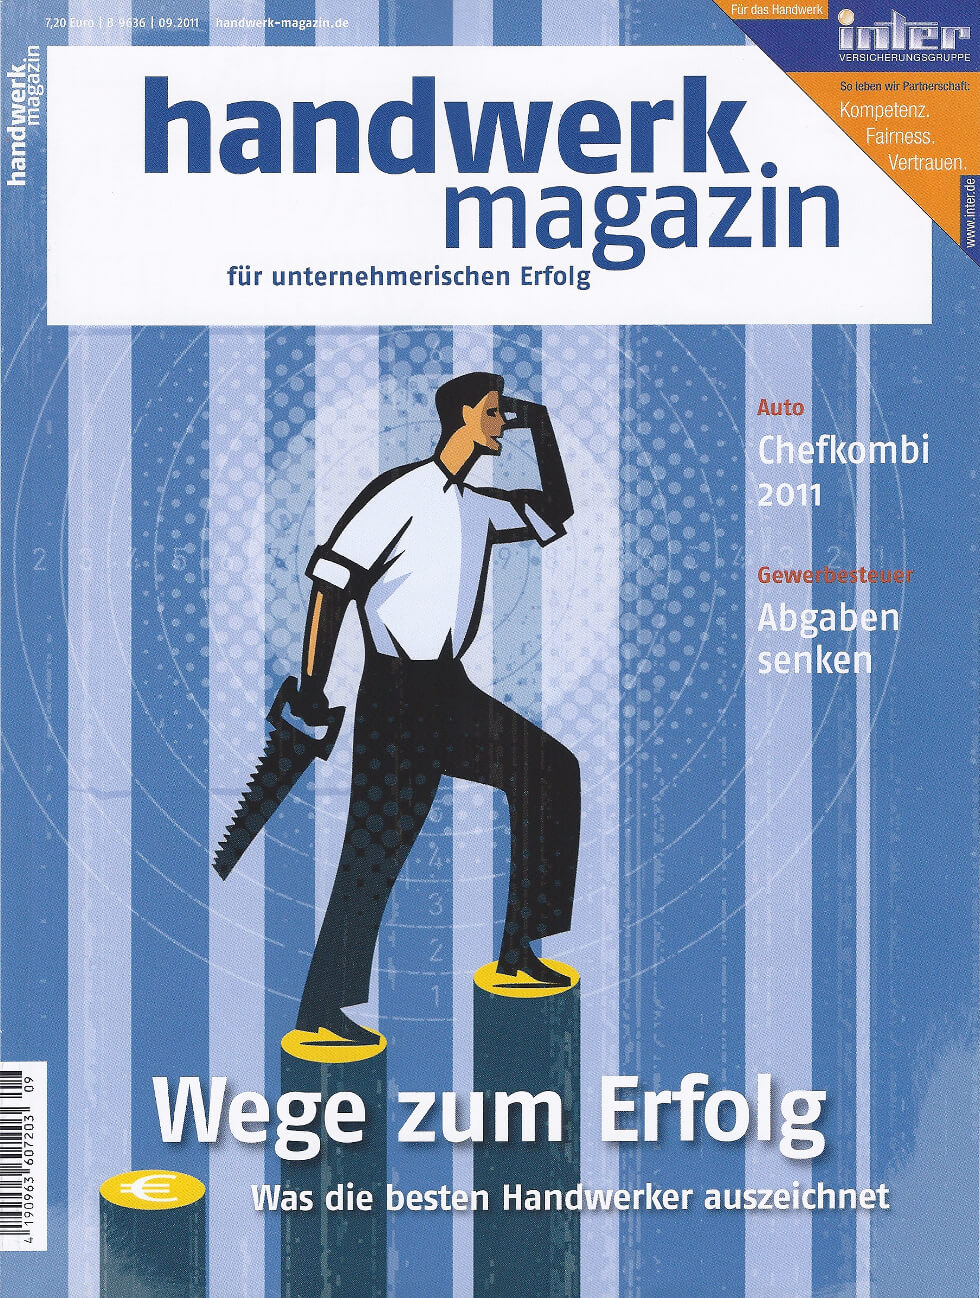 Handwerk Magazin Sep 2011